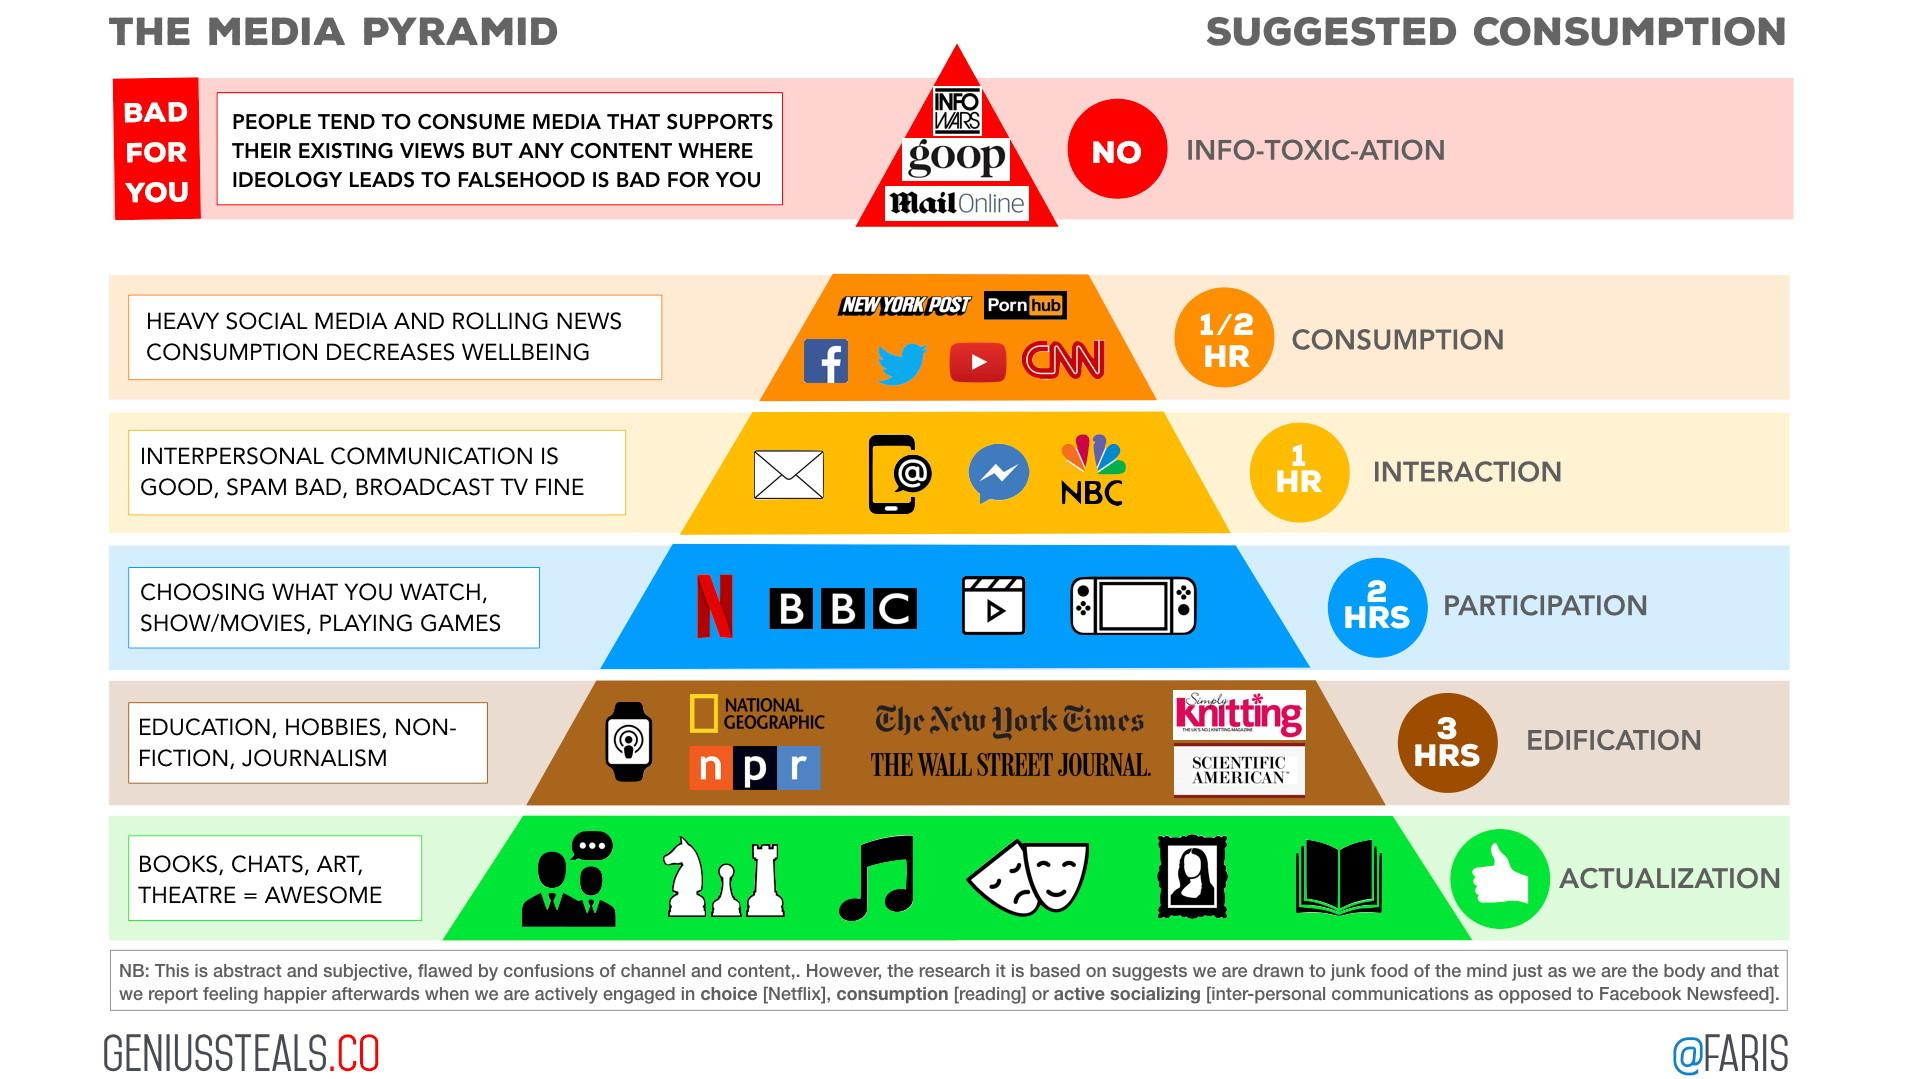 A media pyramid, like the USDA Food Pyramid, that categorizes media according to their health benefits.